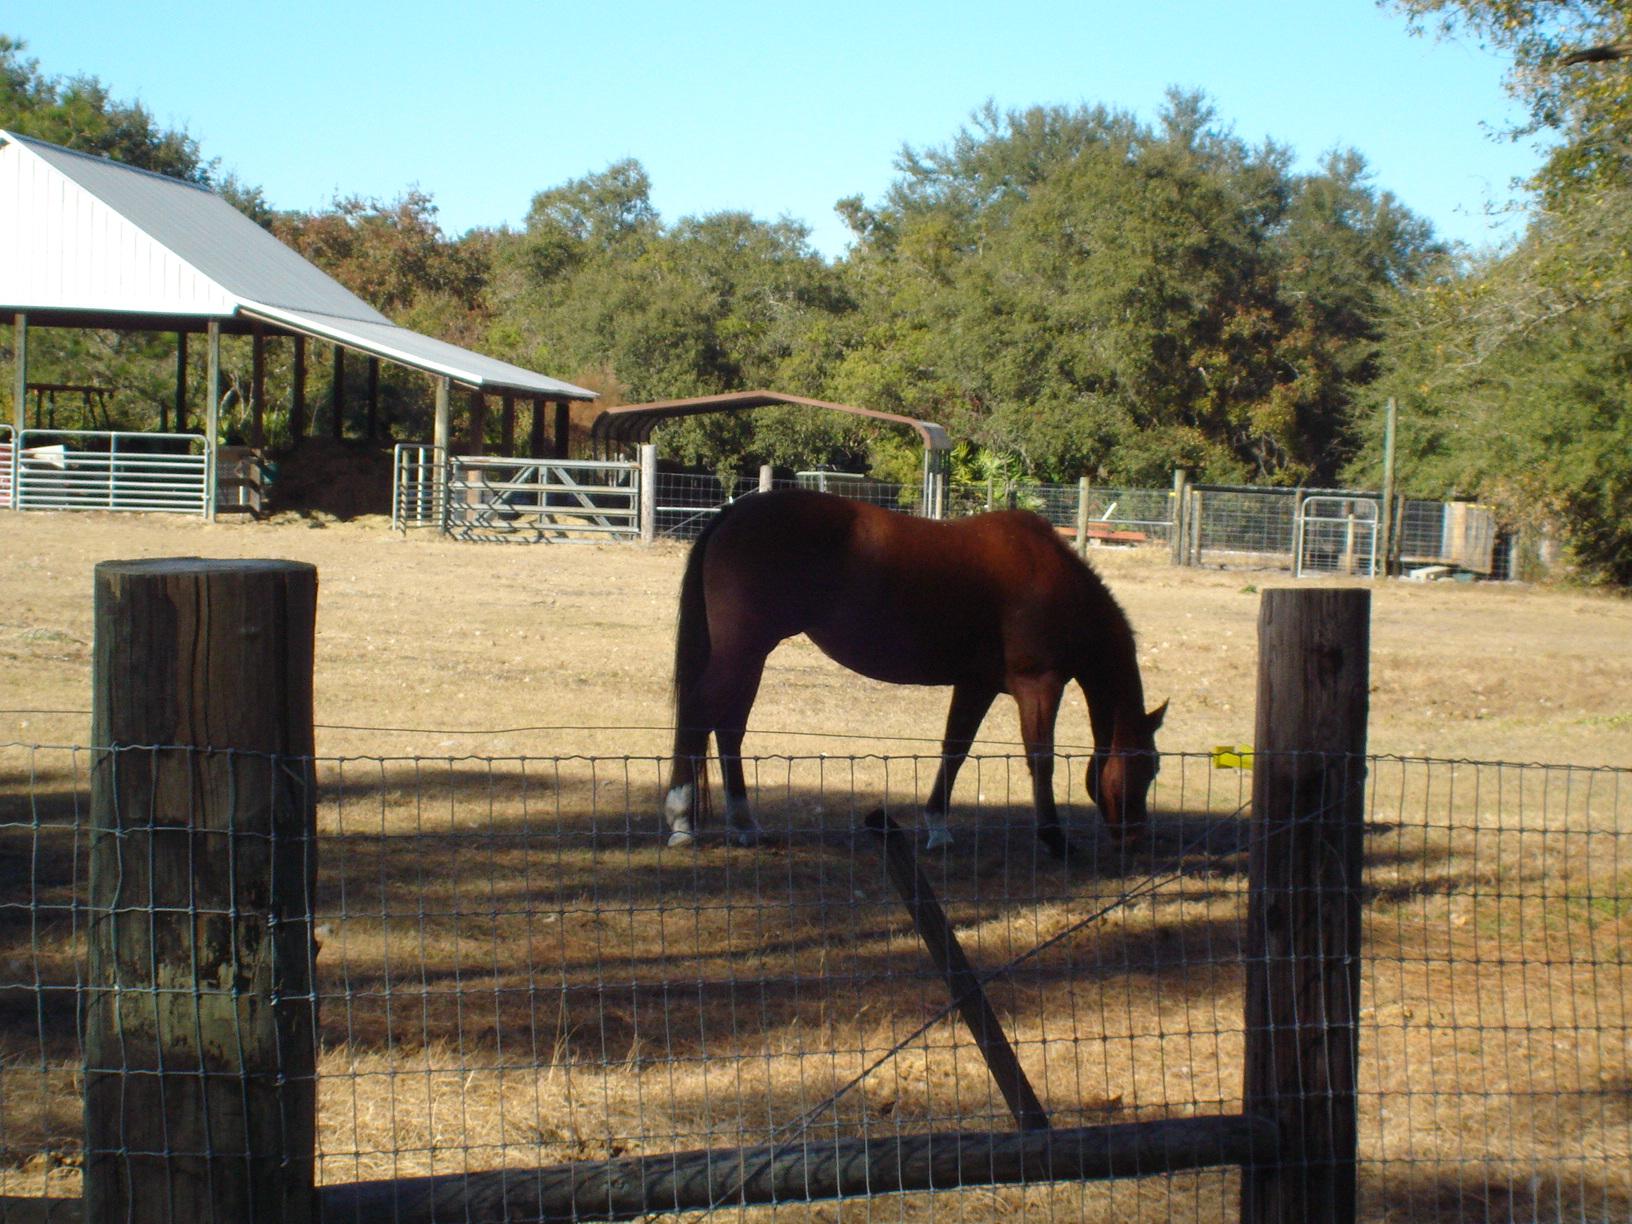 6.33 acres for sale deland florida